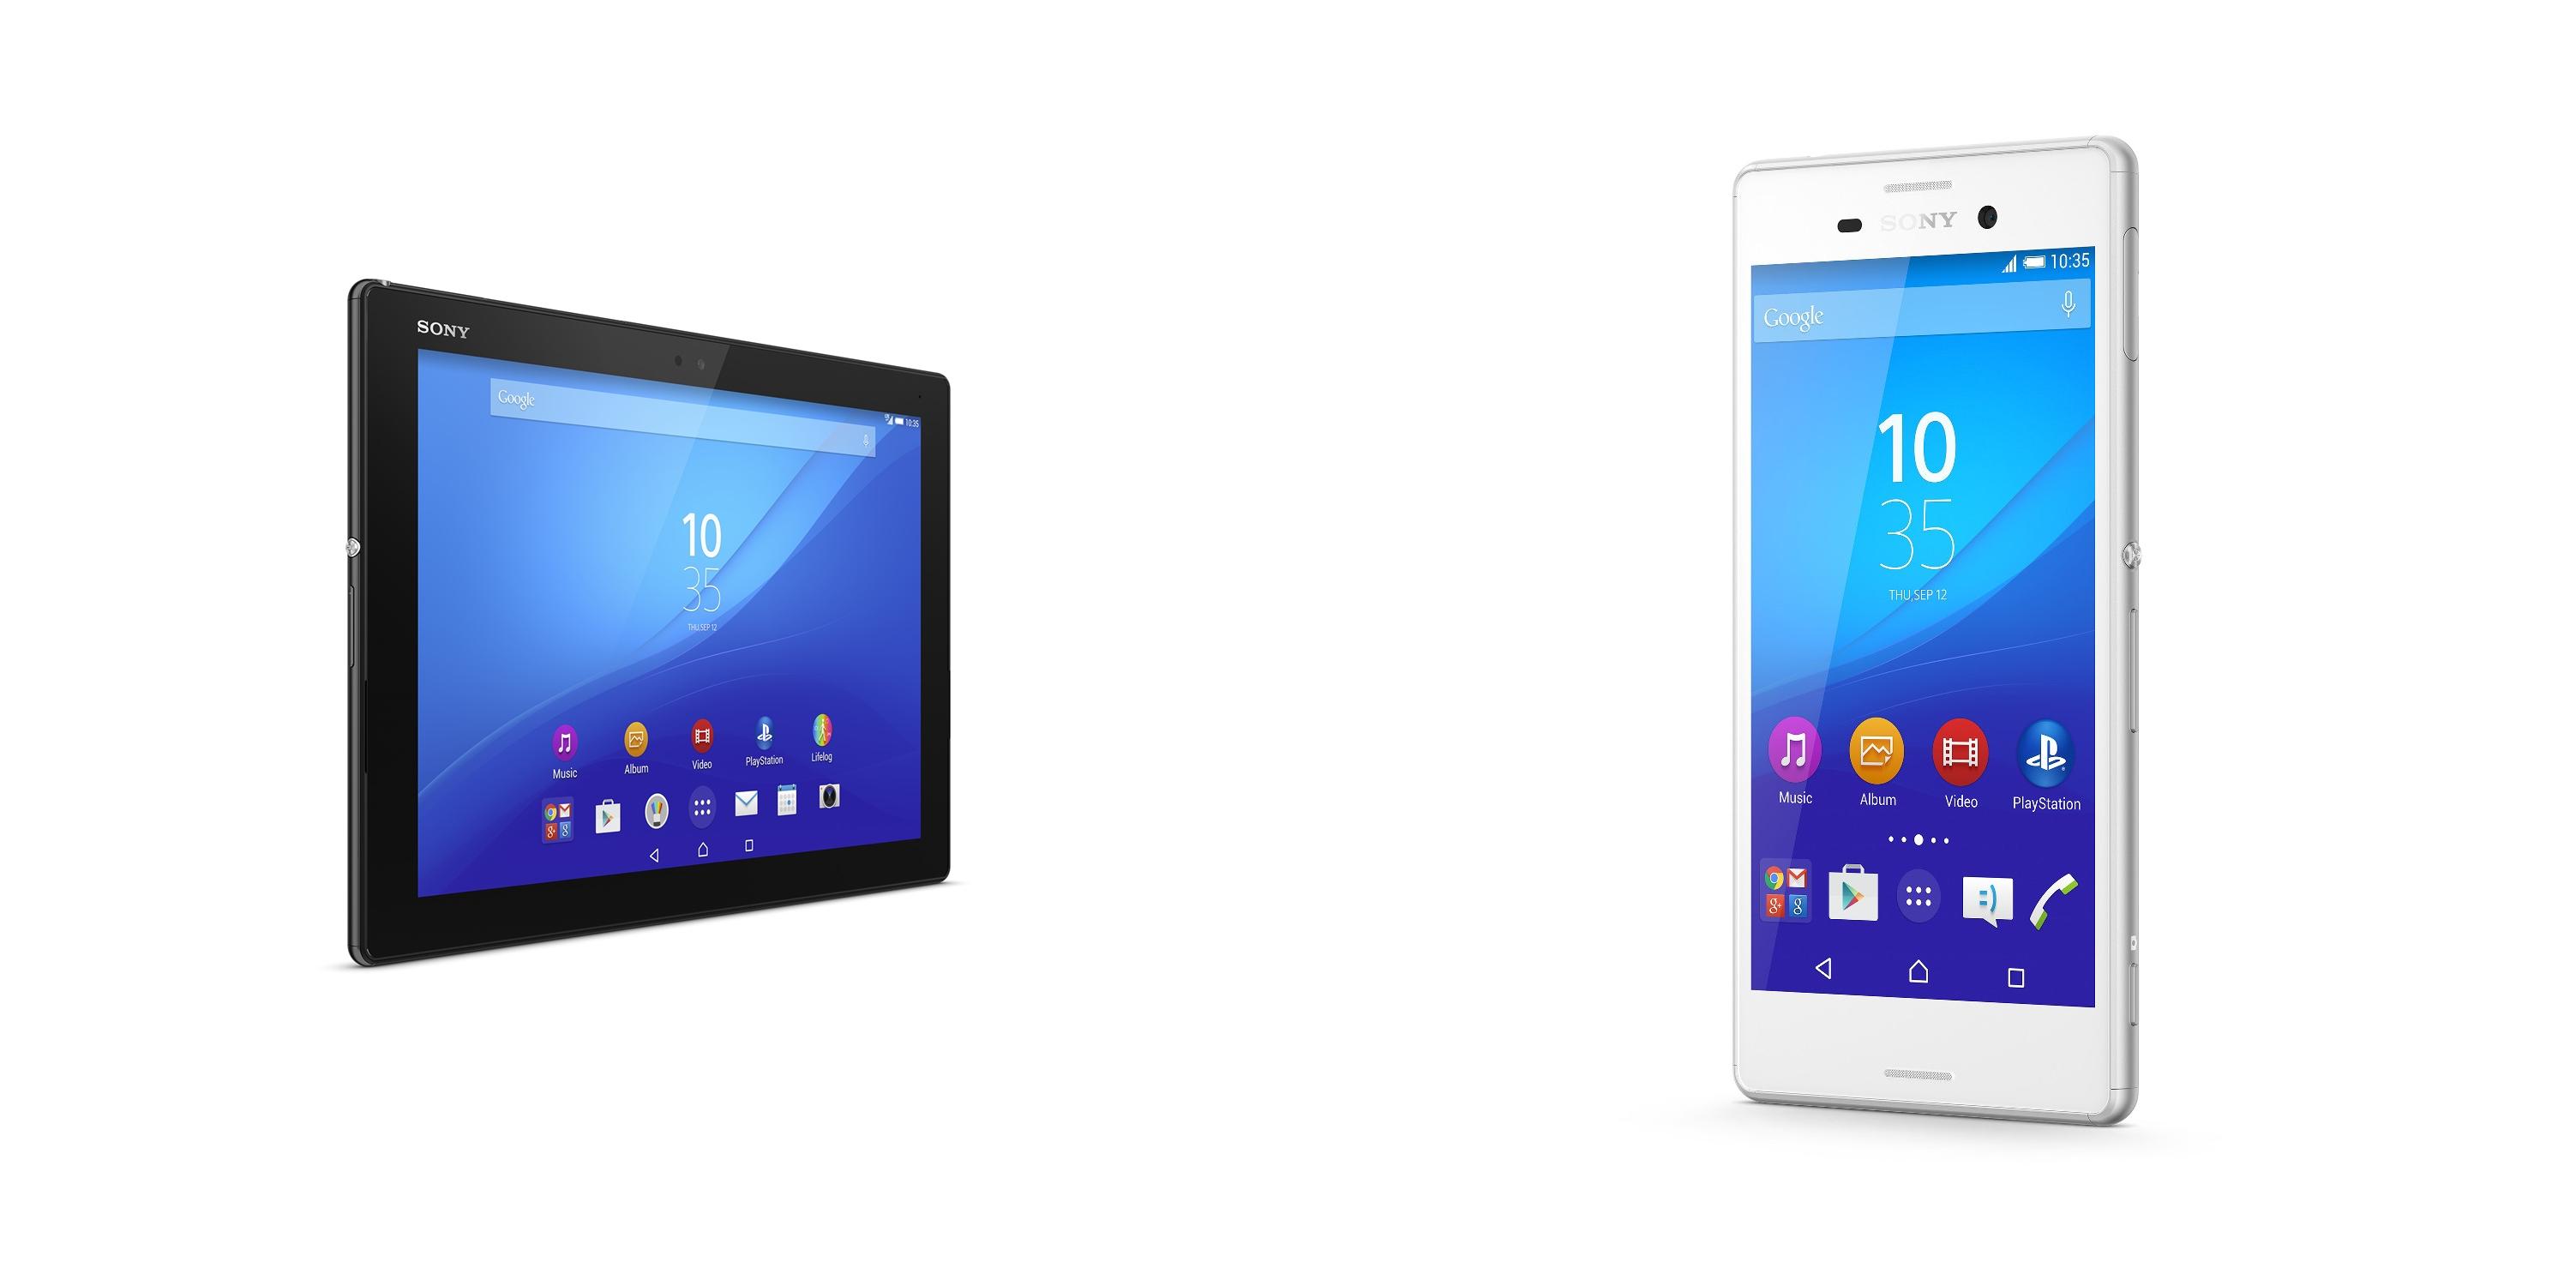 Sony-Xperia-Z4-Tablet-horz